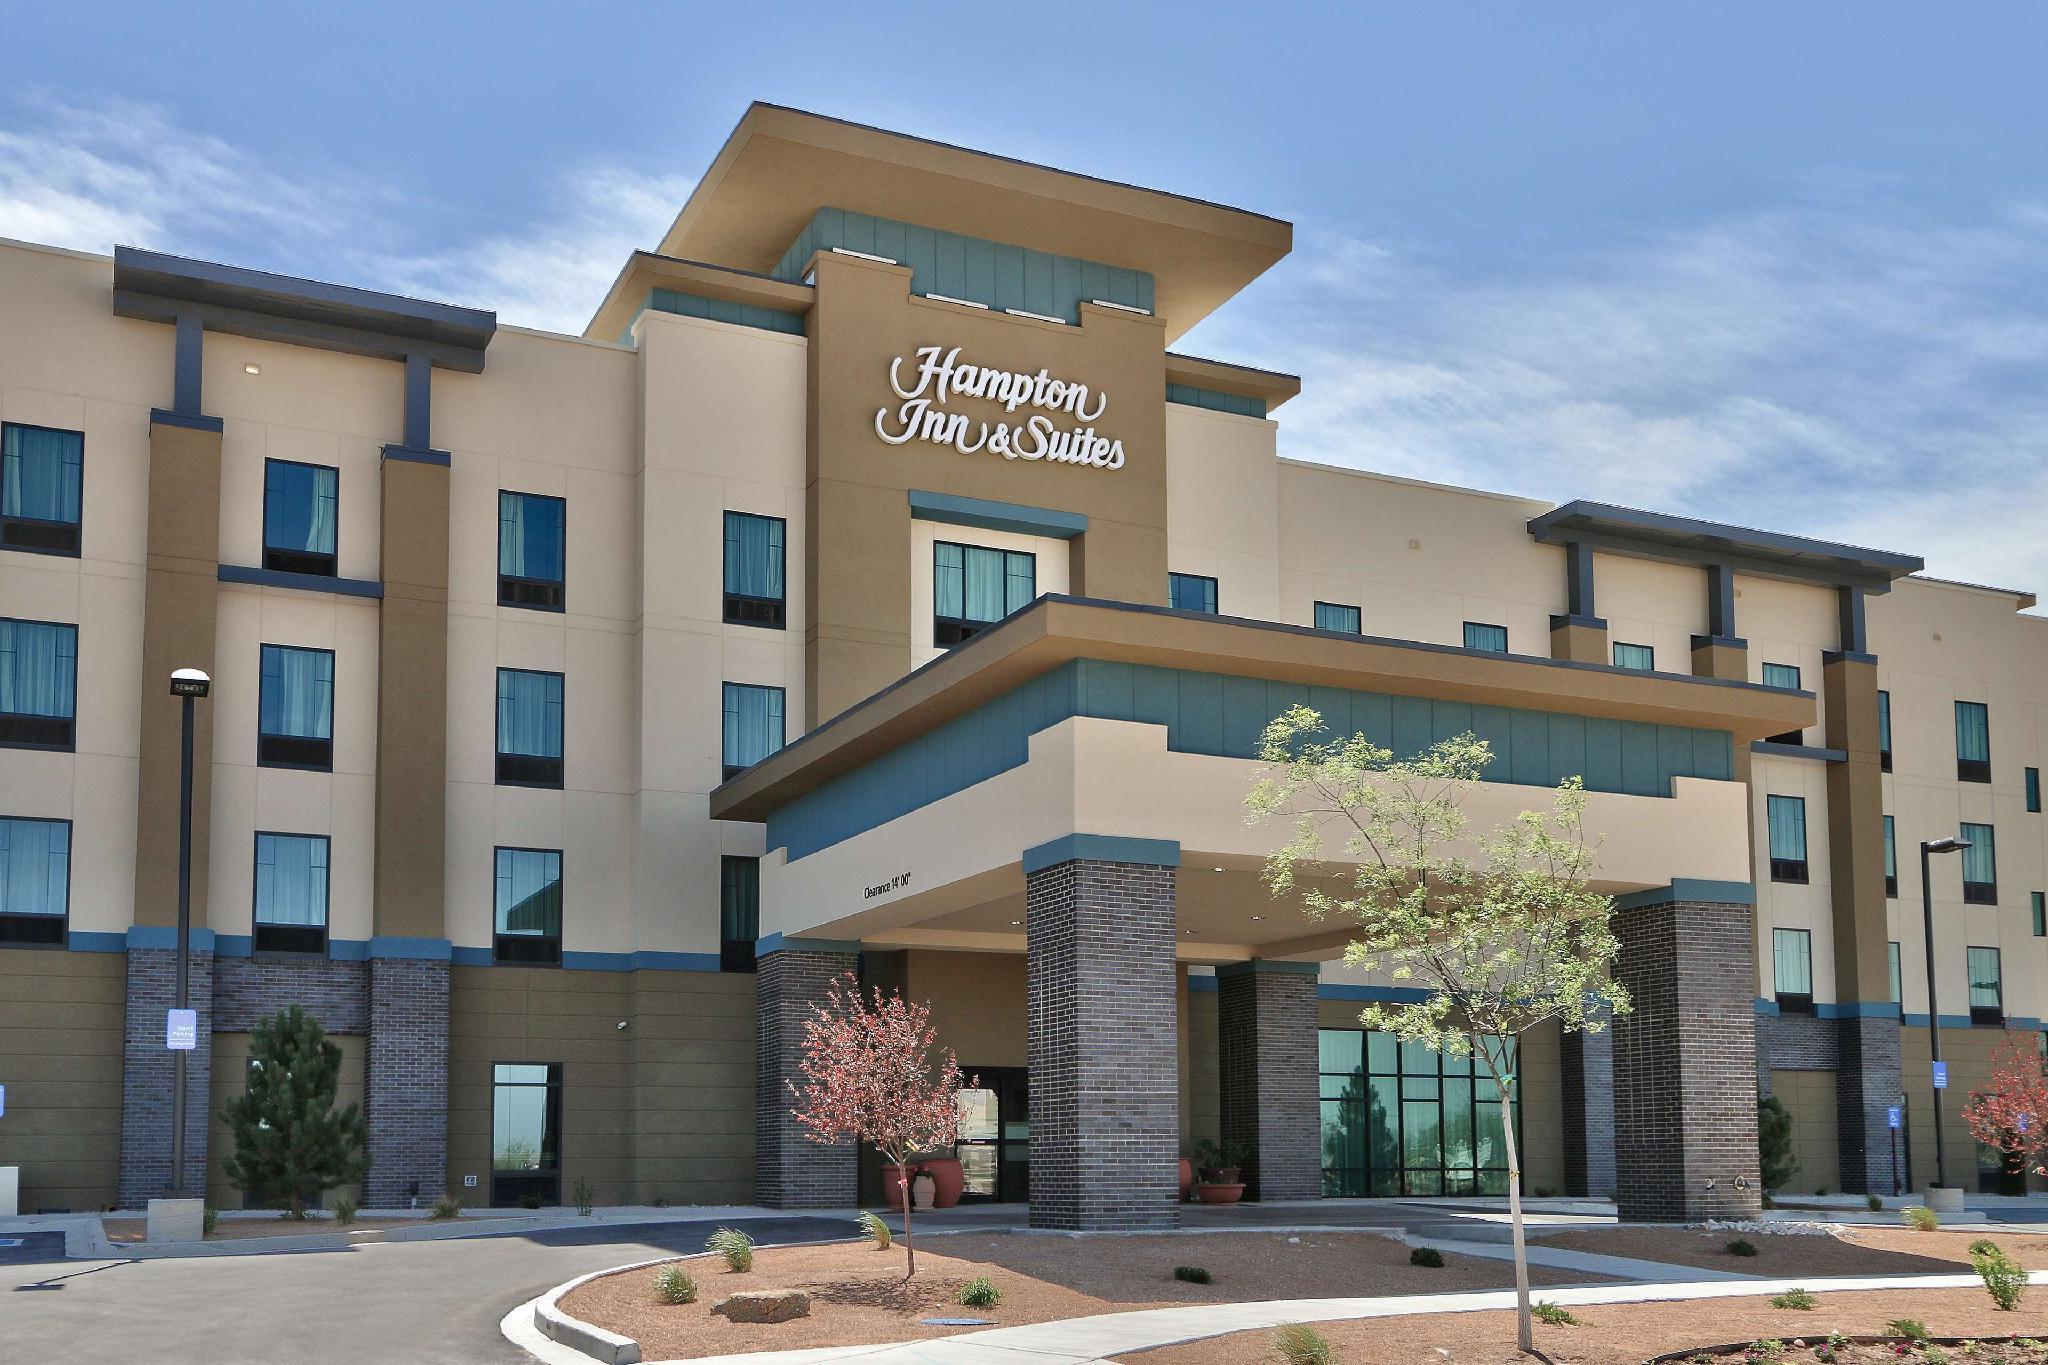 Hampton Inn And Suites Artesia